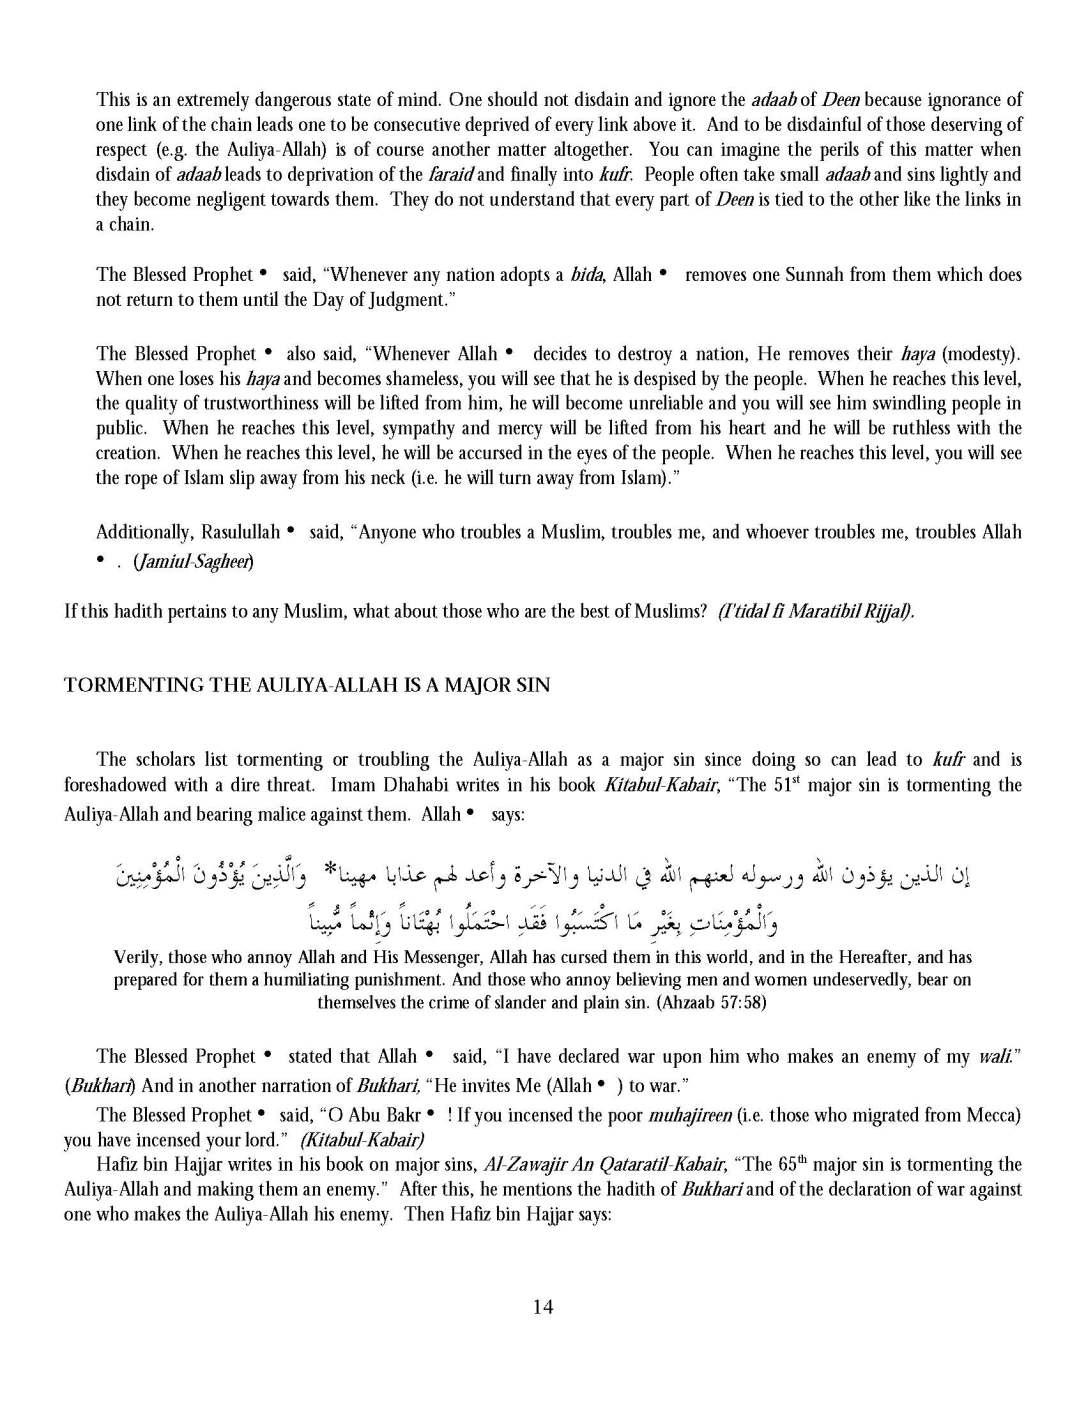 ConsequencesOfDebasingAuliyaAllah_Page_15